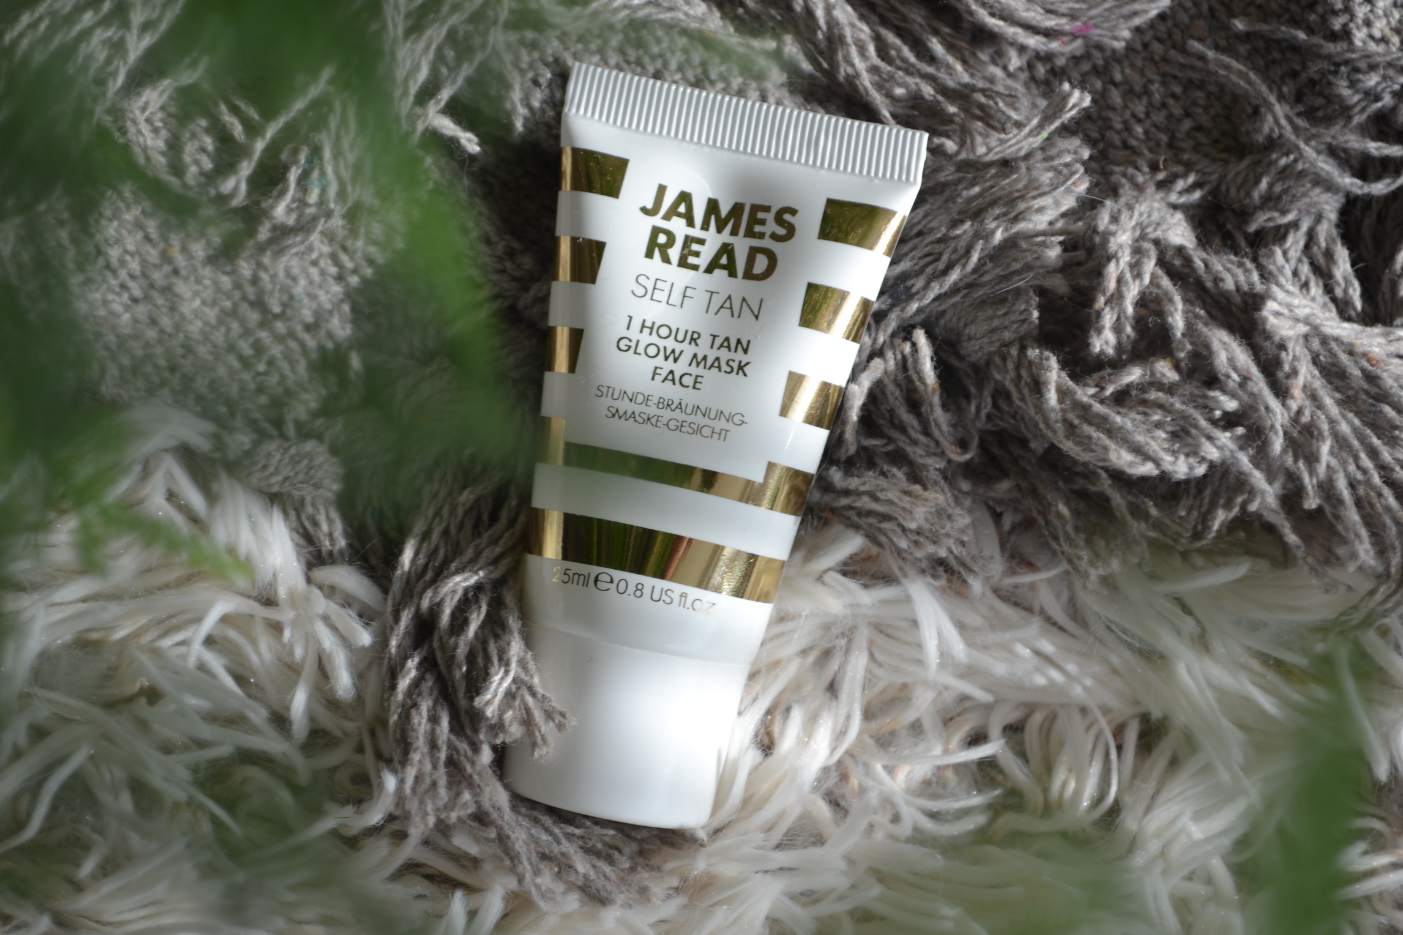 james read self tan 1 hour tan glow mask face 1